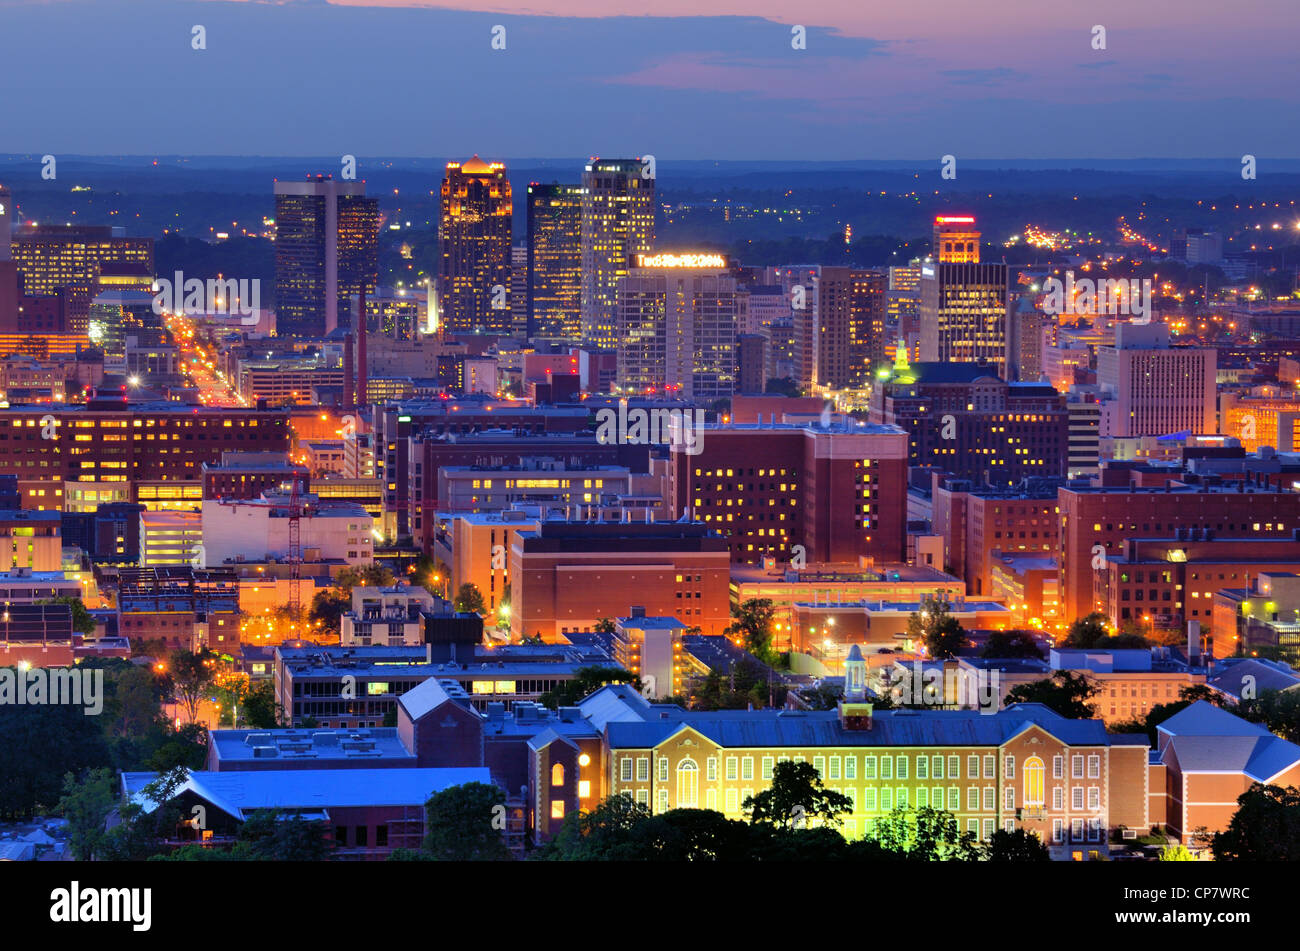 Downtown skyline of Birmingham, Alabama, USA at night. - Stock Image